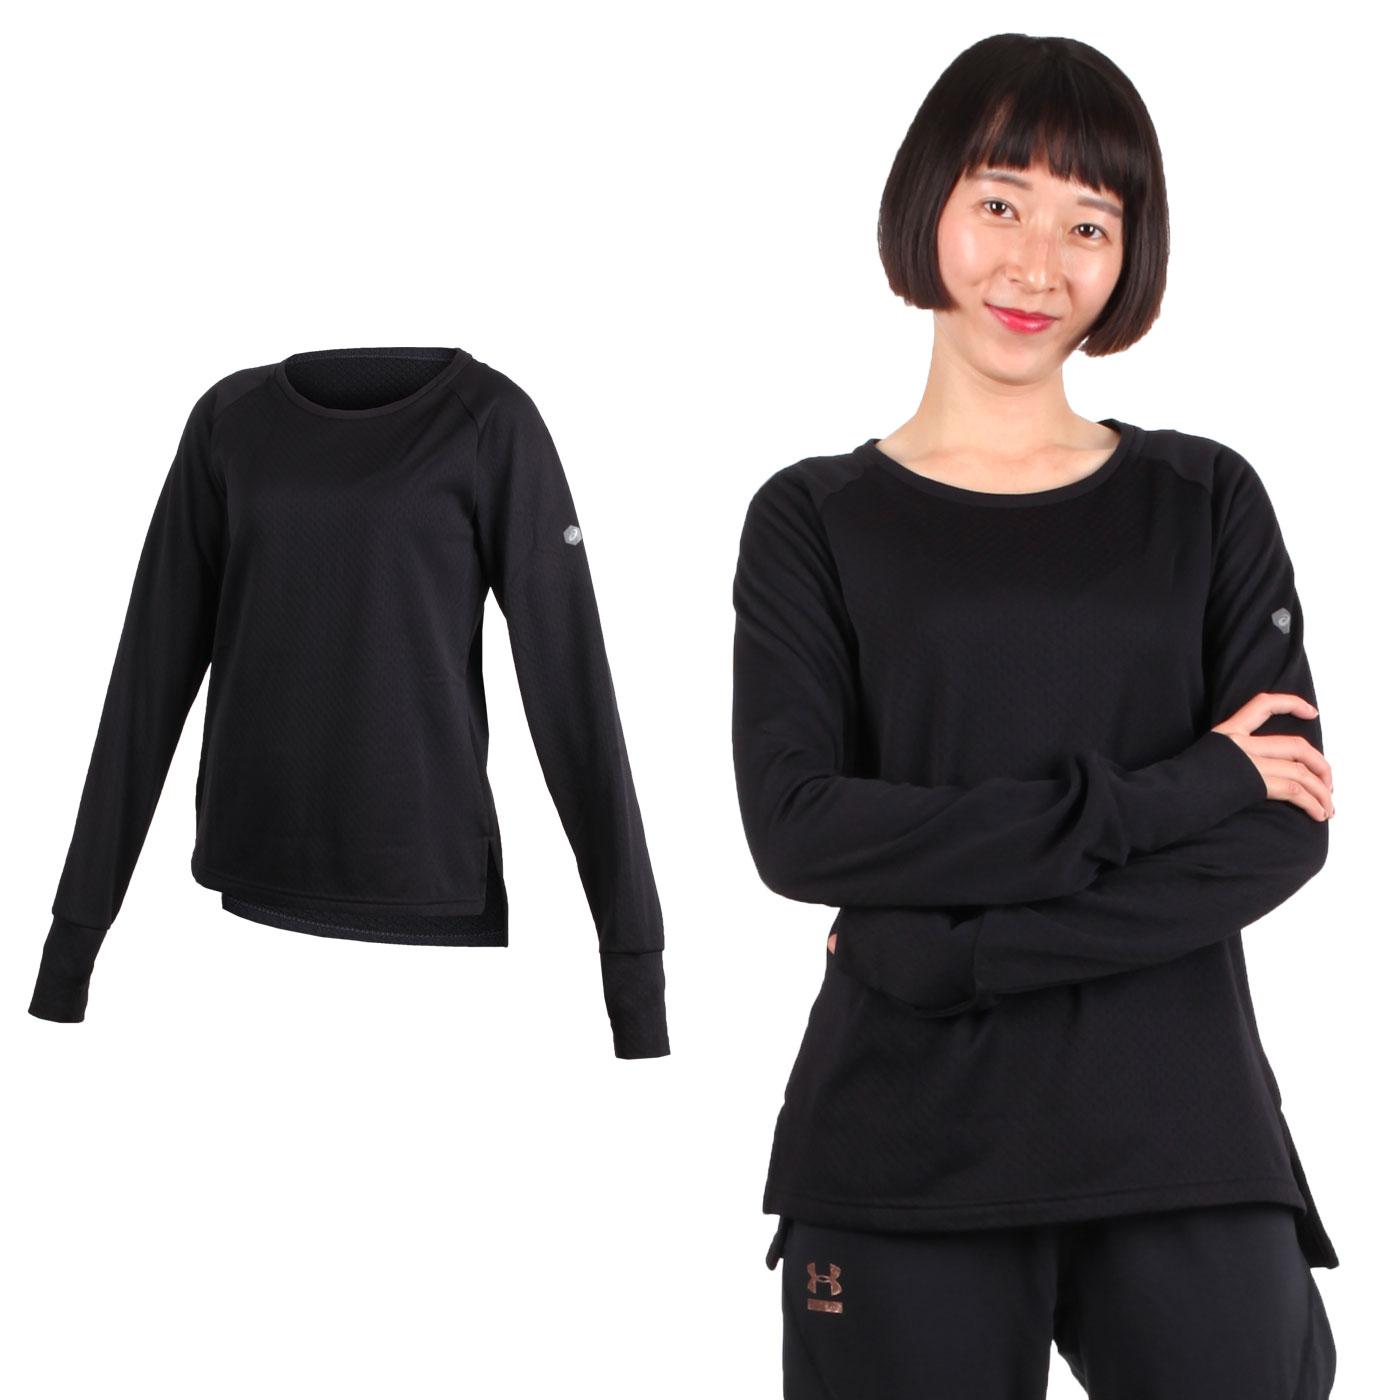 ASICS 女長袖內刷毛保暖T恤 2032A870-002 - 黑